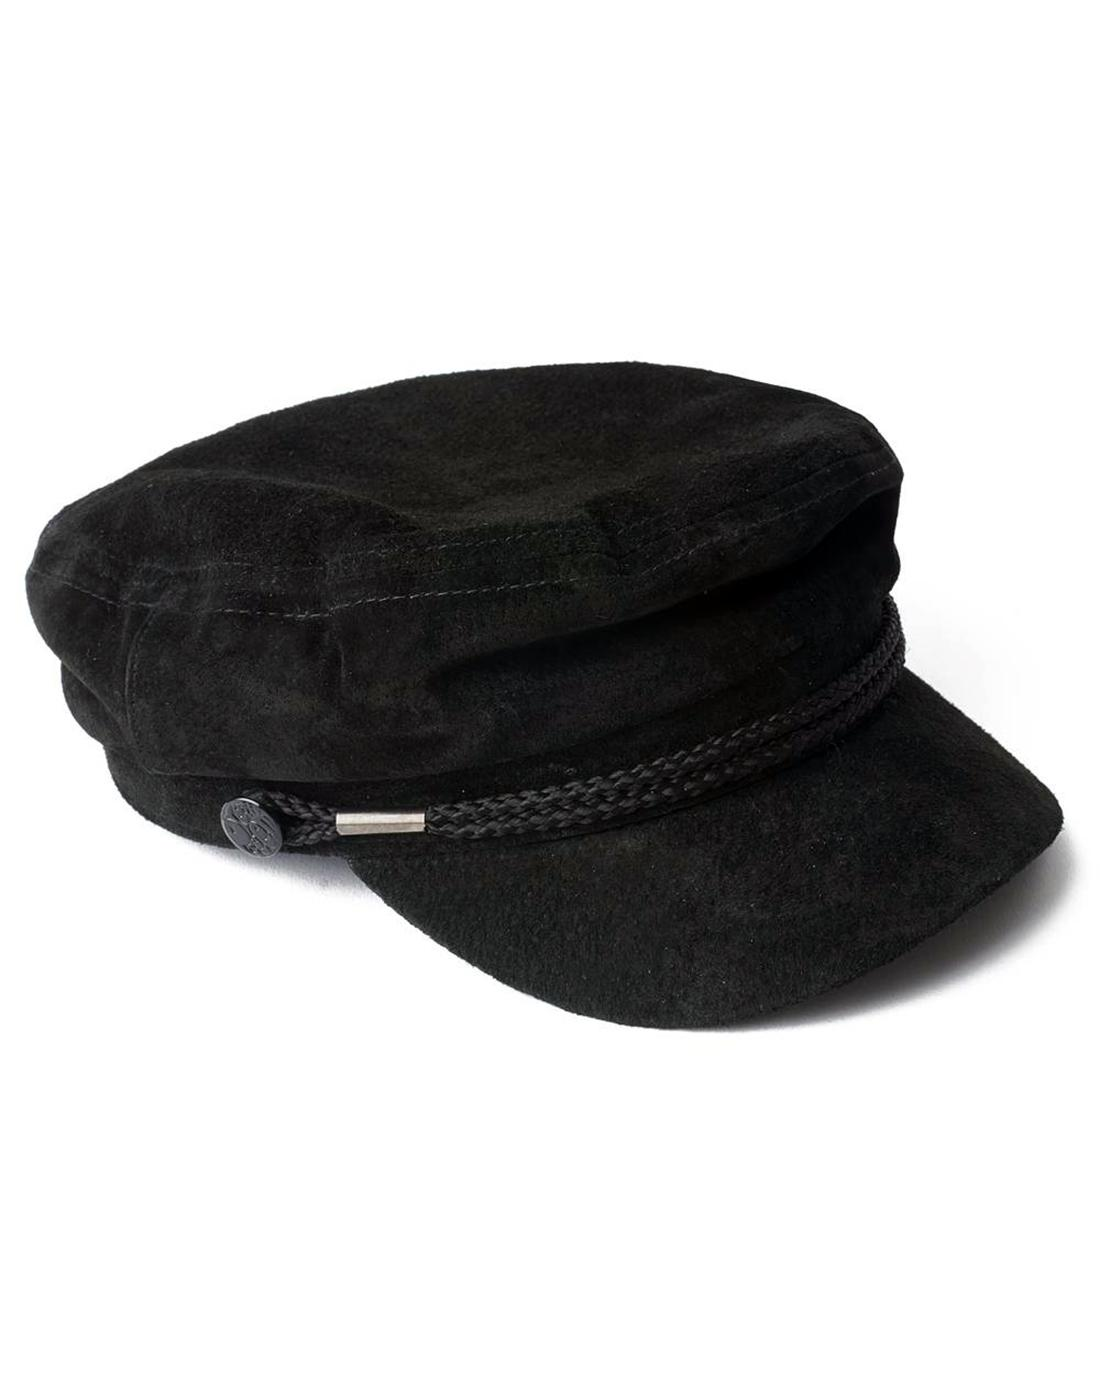 PRETTY GREEN Men's Retro Mod 60s Suede Beatle Hat